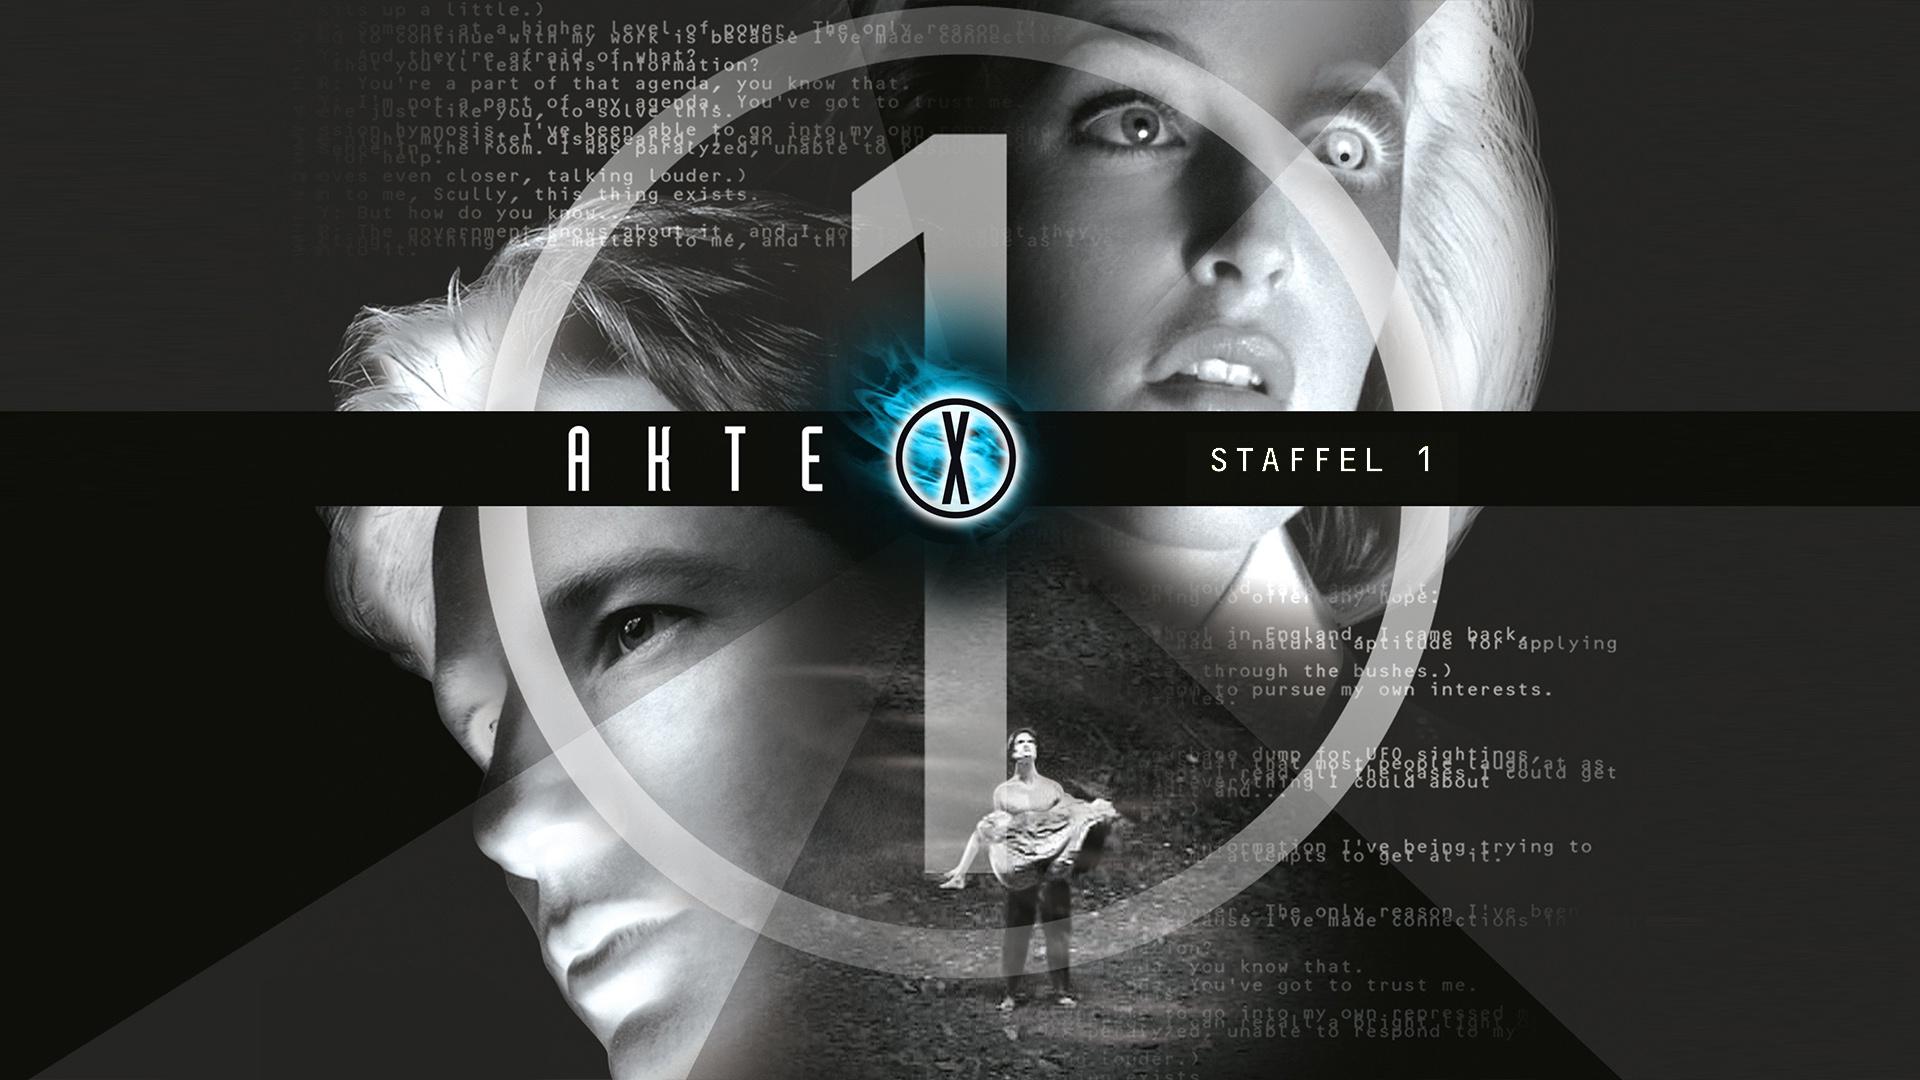 Akte X - Staffel 1